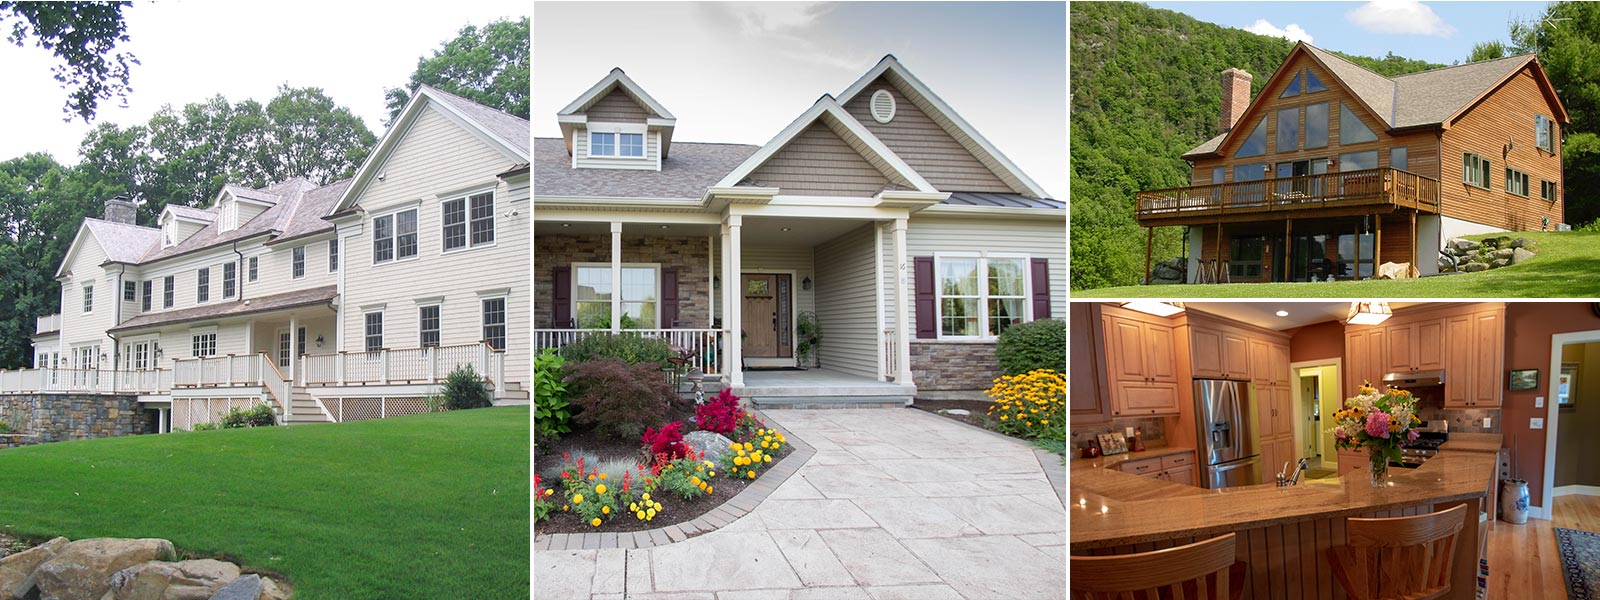 Custom Panelized Home Collage